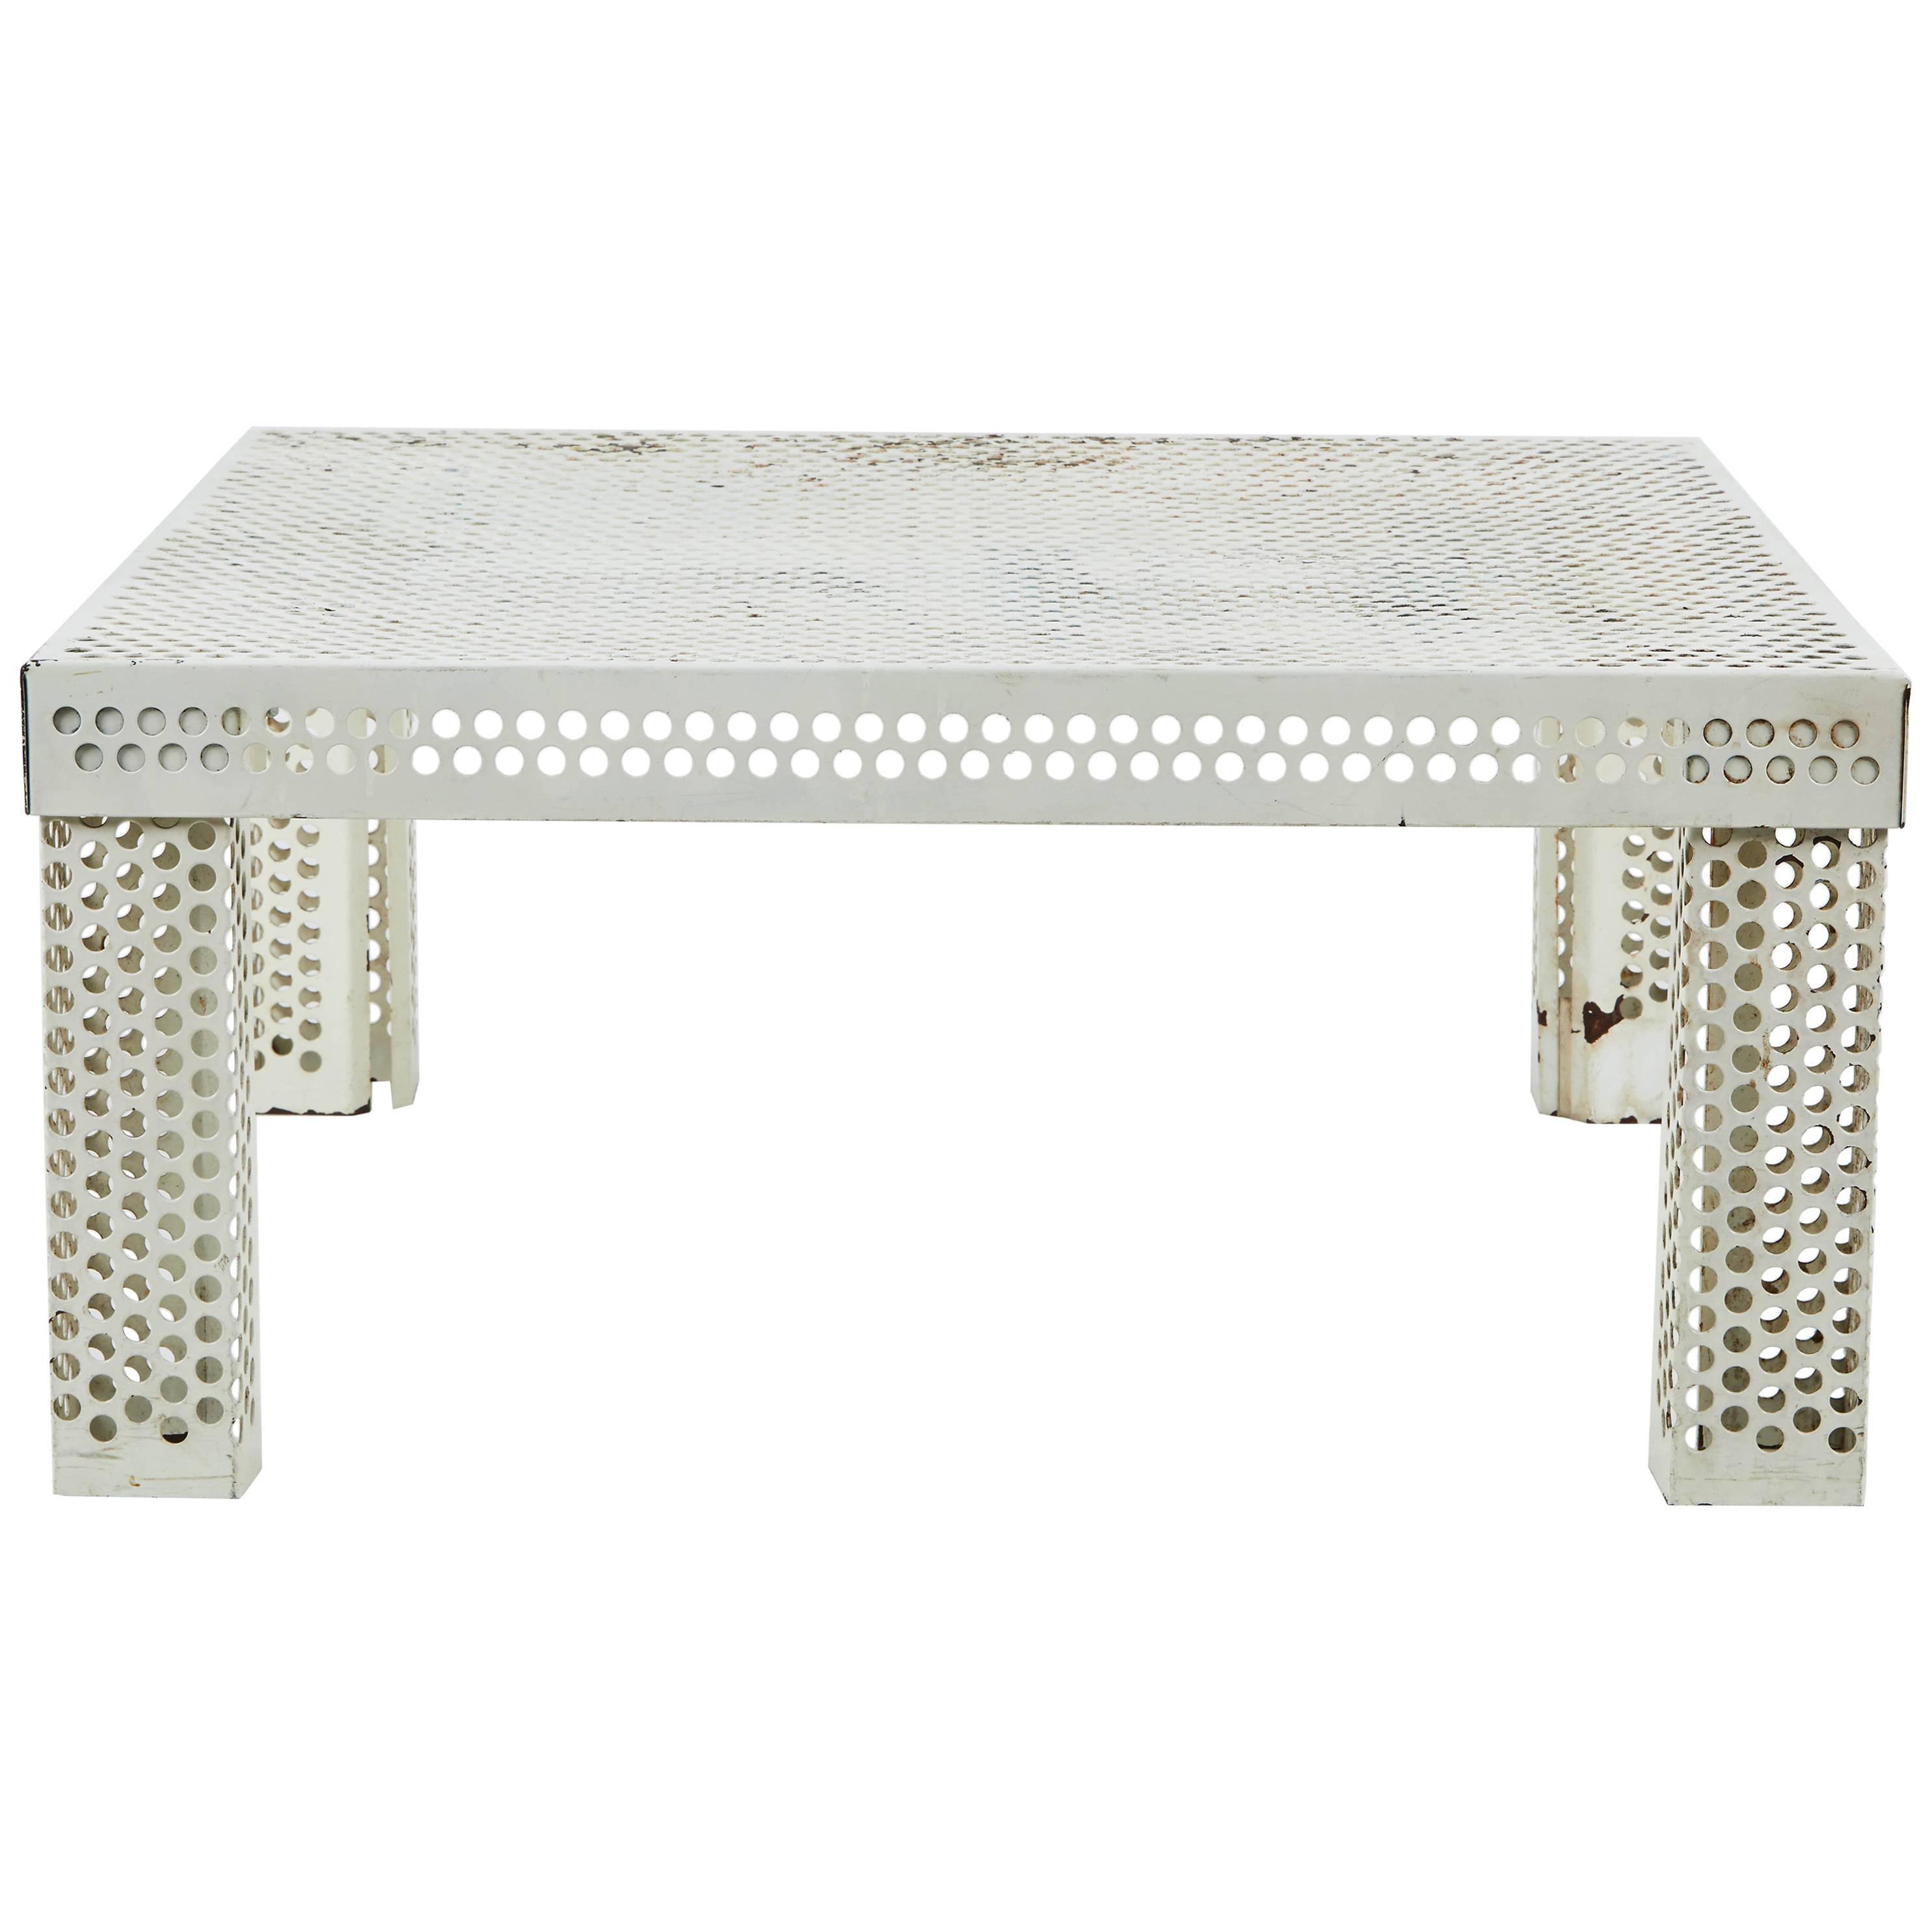 Mathieu Matégot Style Perforated White Metal Coffee Table